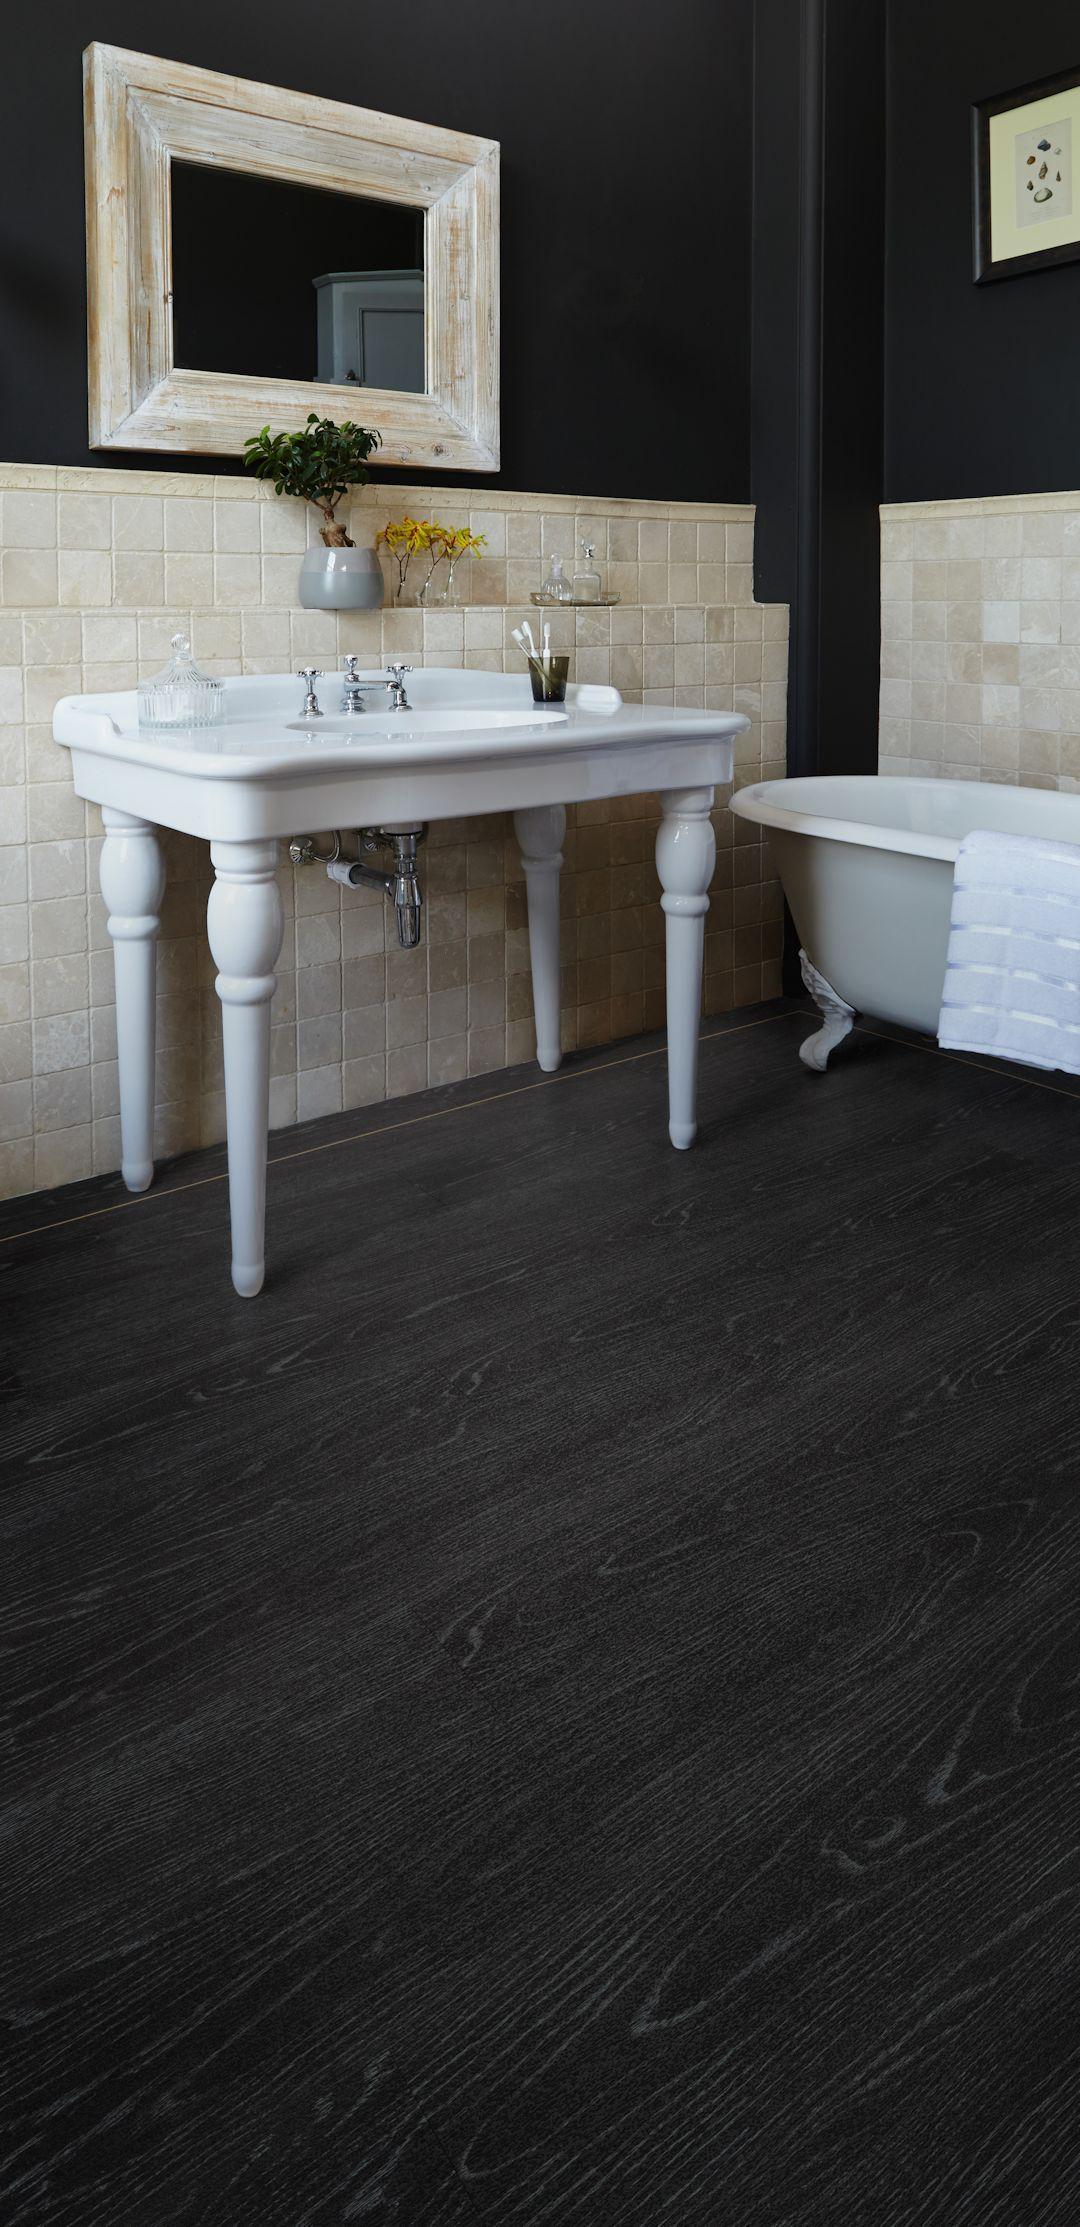 Midnight ash camaro luxury vinyl tile flooring featured in midnight ash camaro luxury vinyl tile flooring featured in bathroom dailygadgetfo Image collections